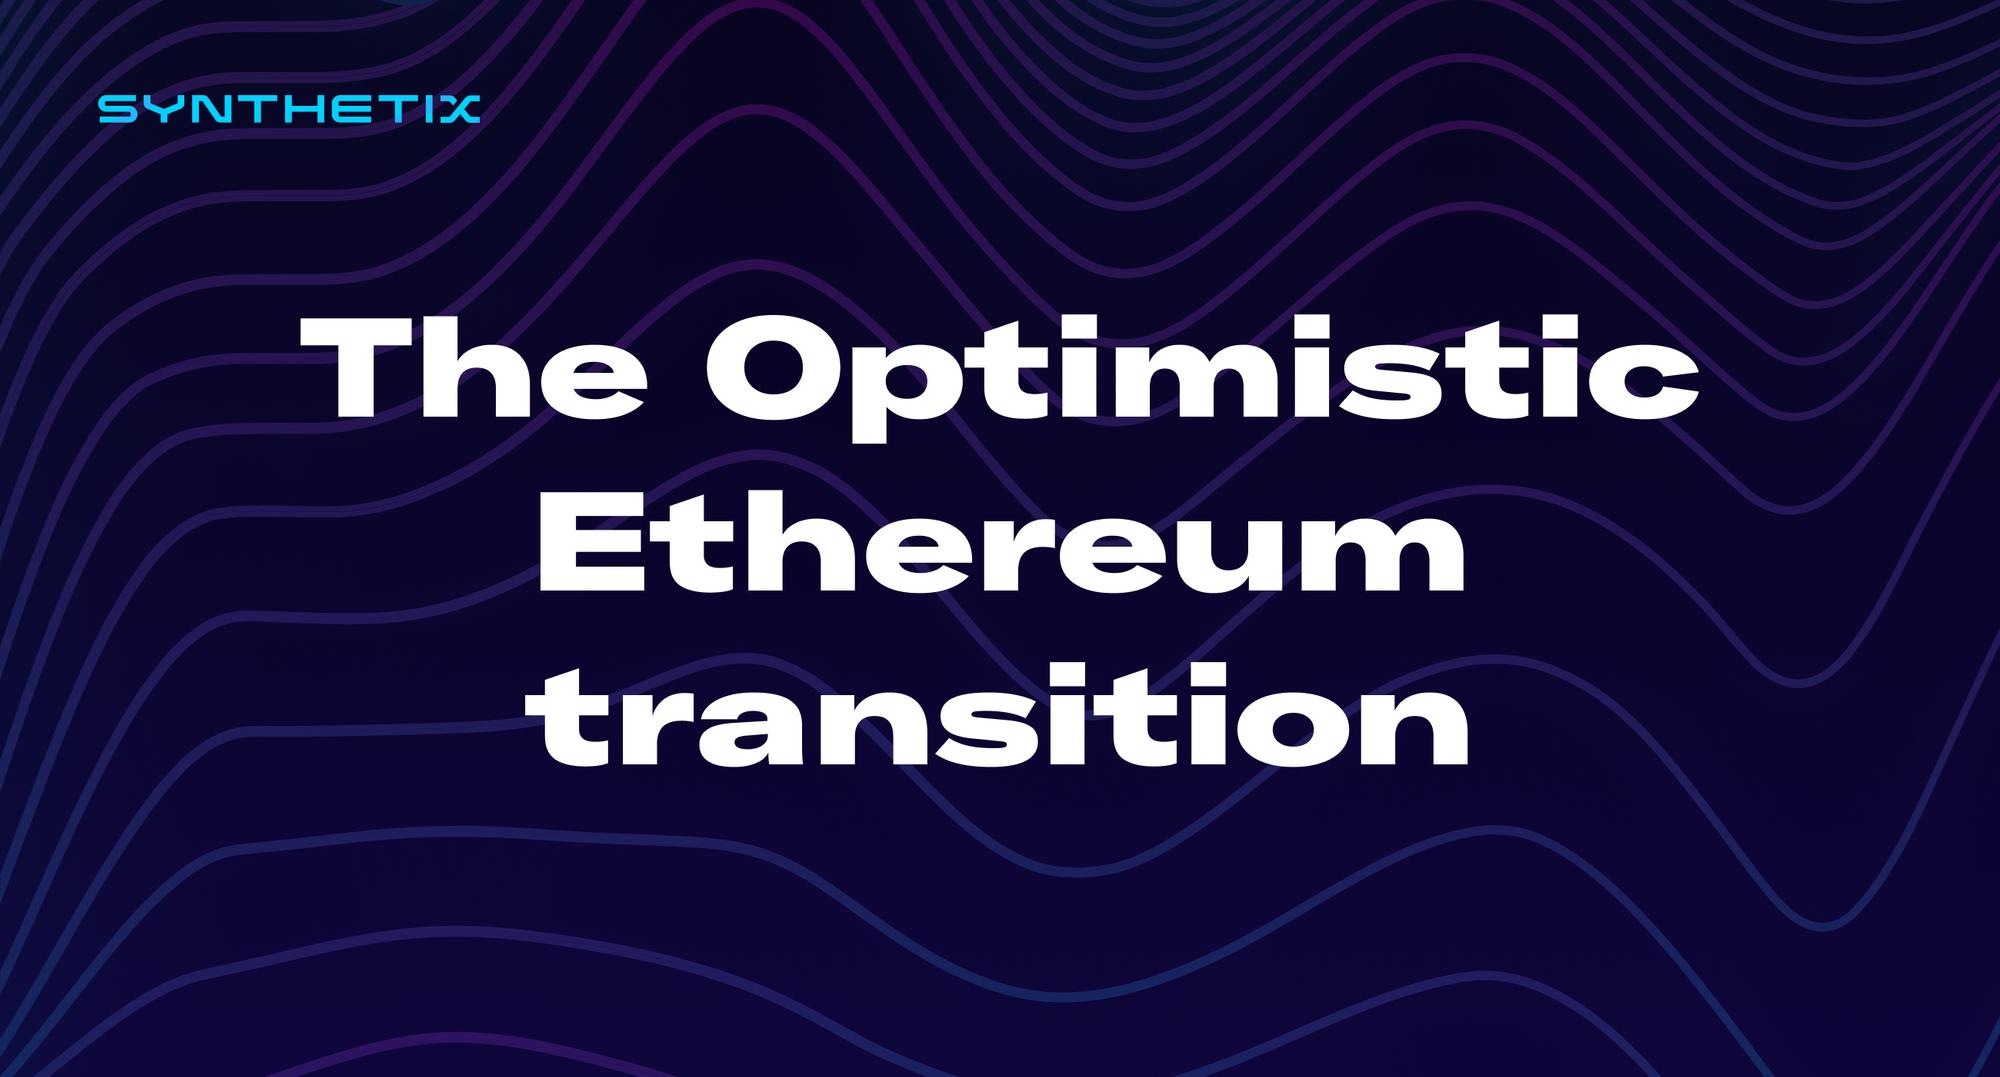 The Optimistic Ethereum Transition